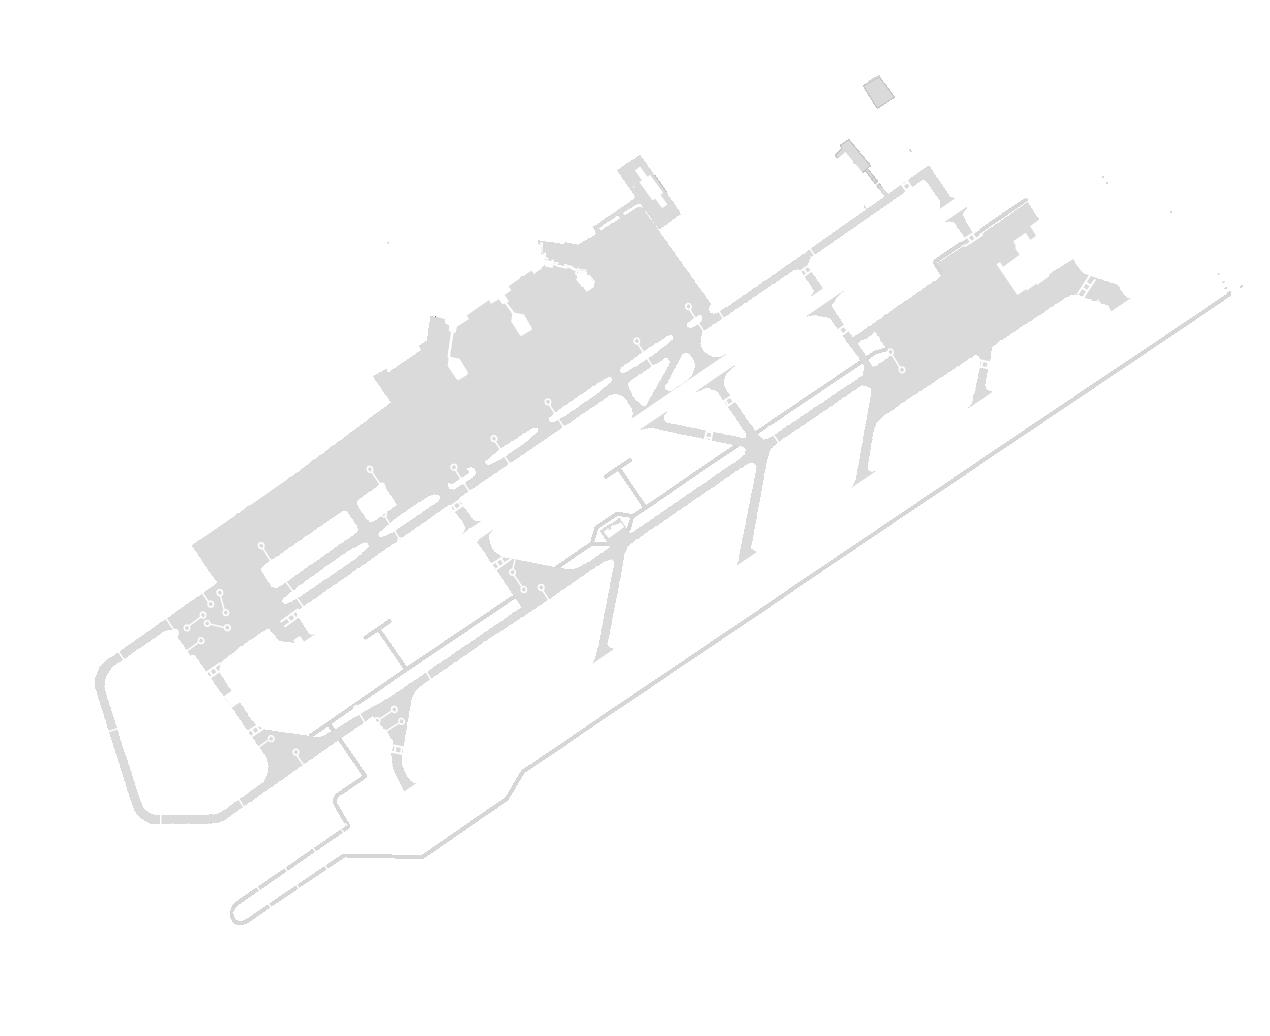 mappa milanomal